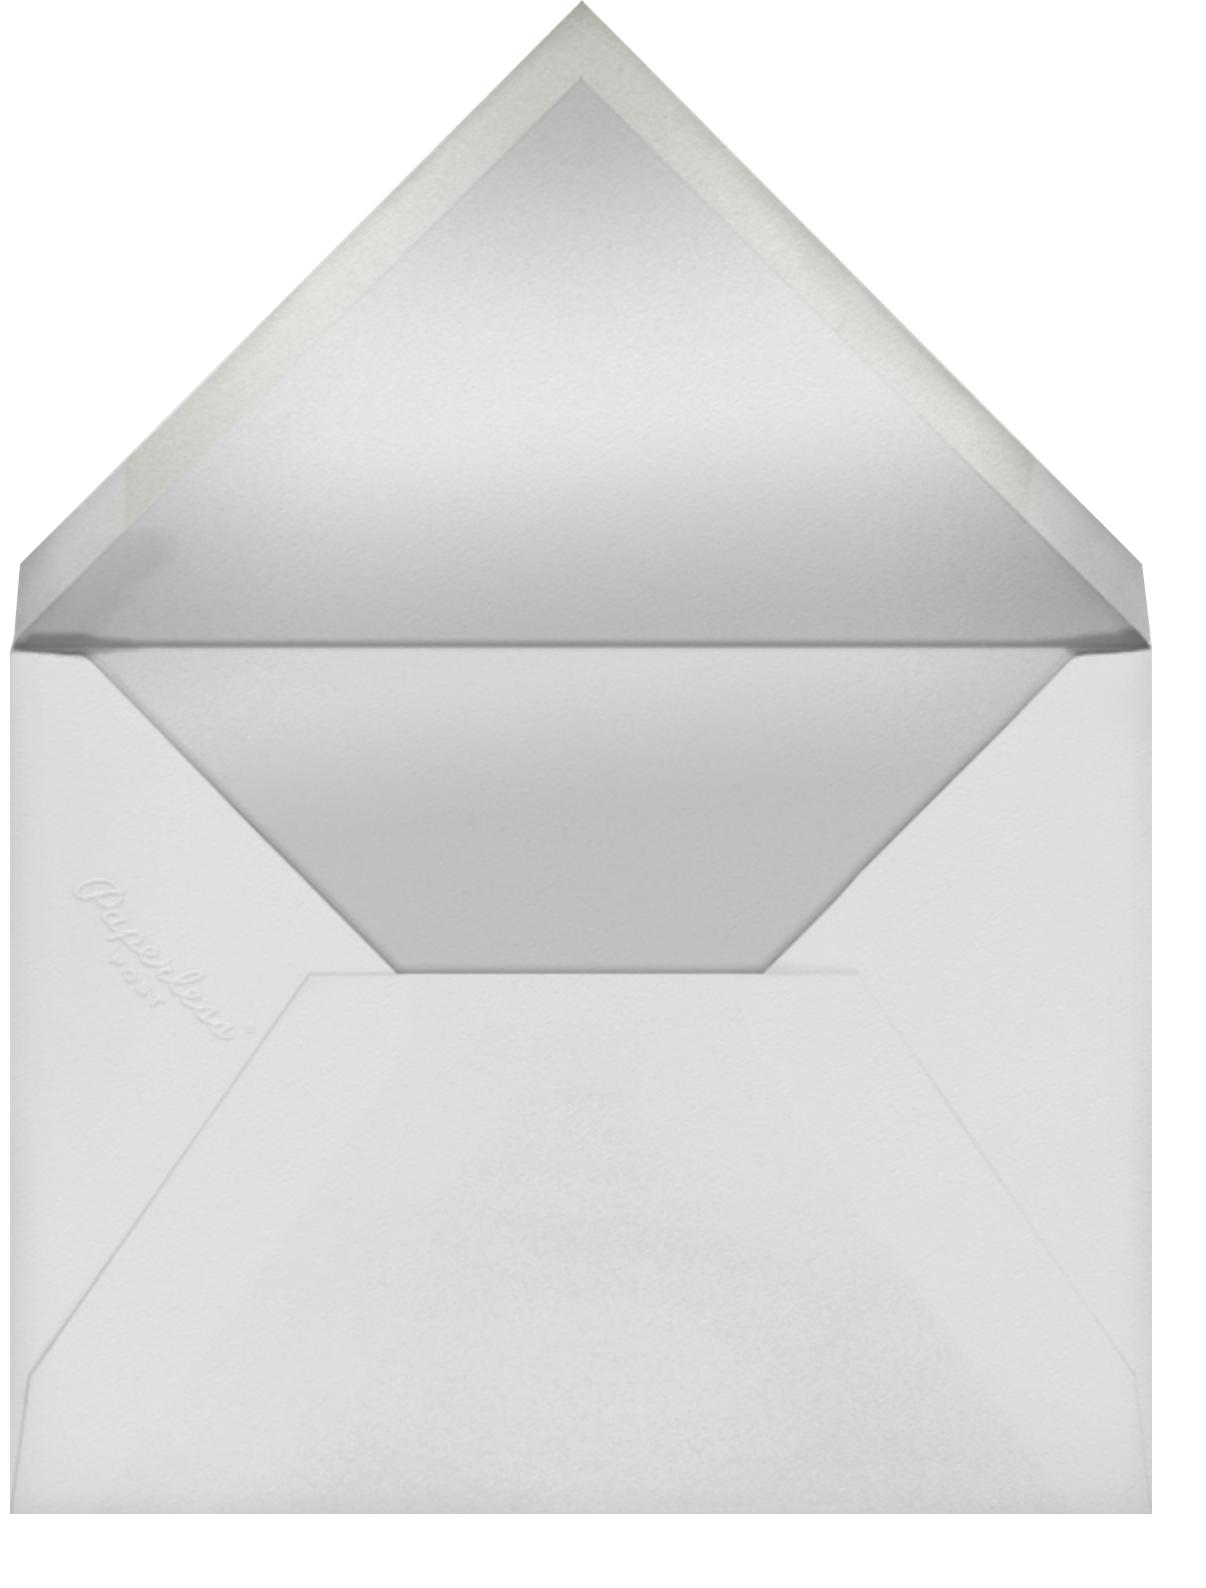 Plumier (Program) - Paperless Post - Menus and programs - envelope back